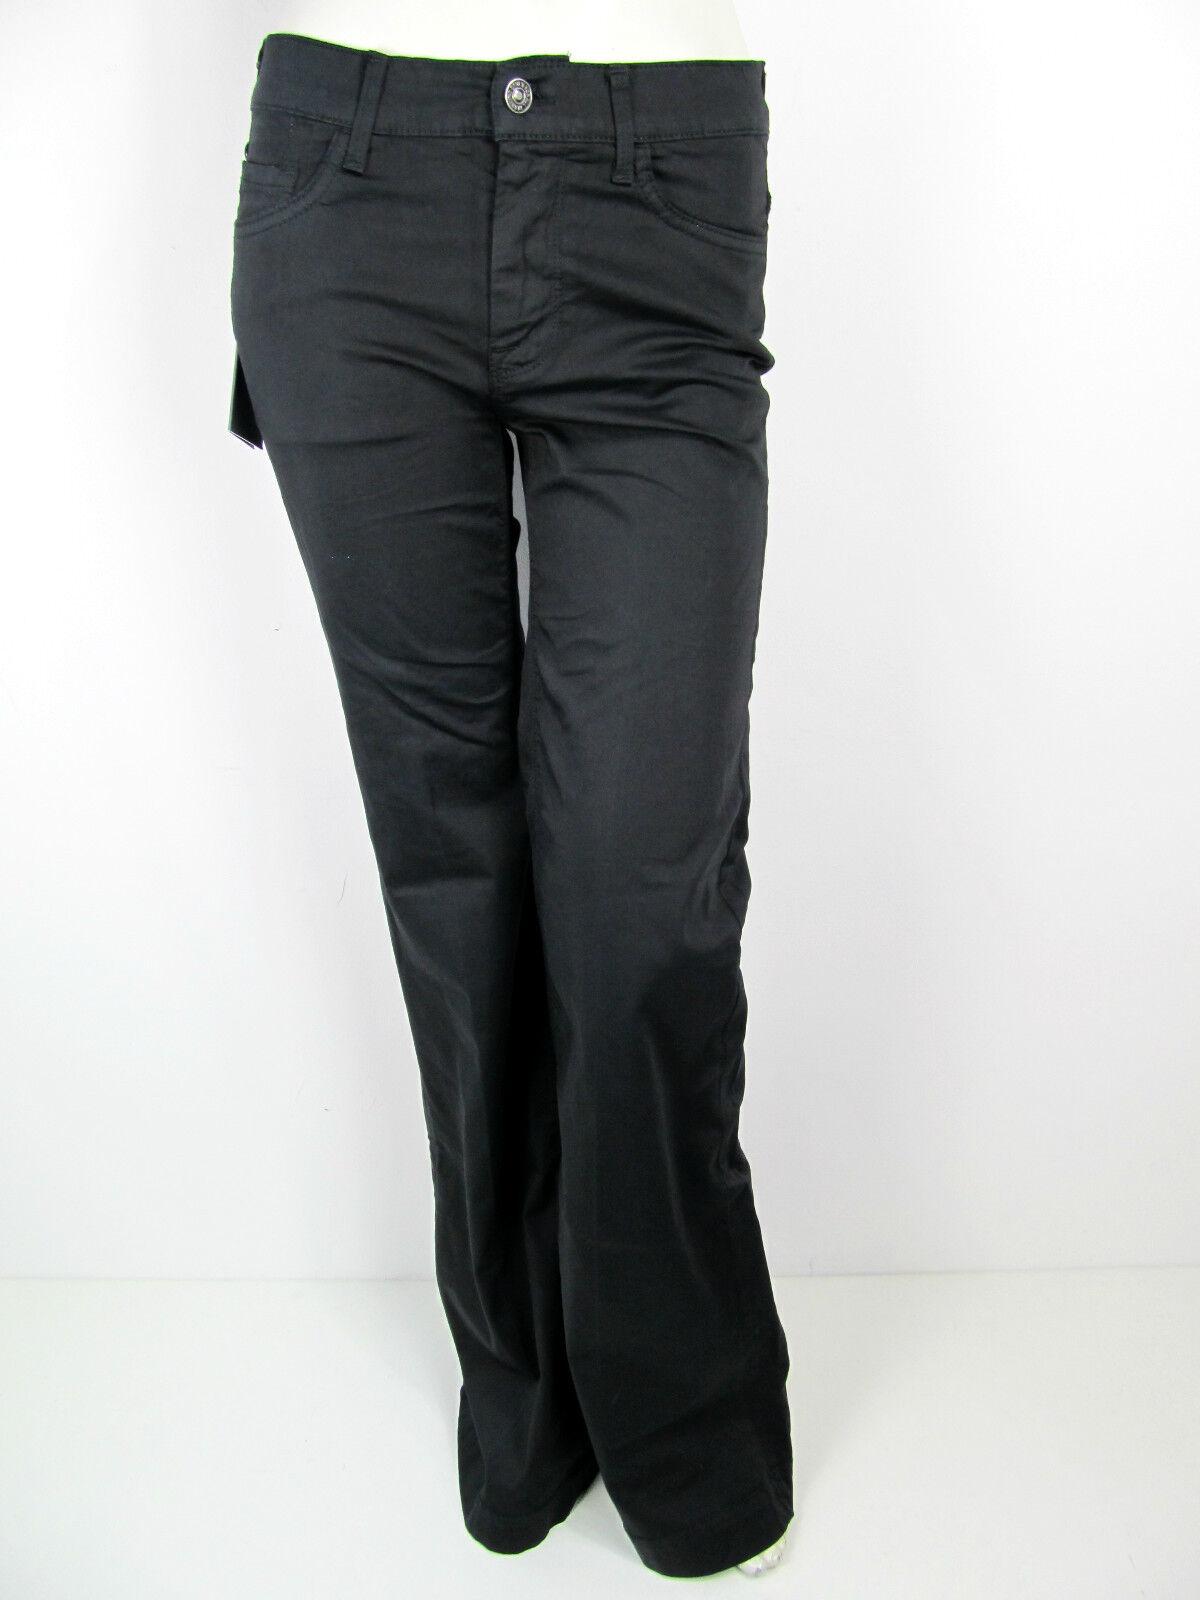 Seven For All Mankind SFAM 7fam Ginger Jeans Pants PANTALON schwarz 27 28 29 30